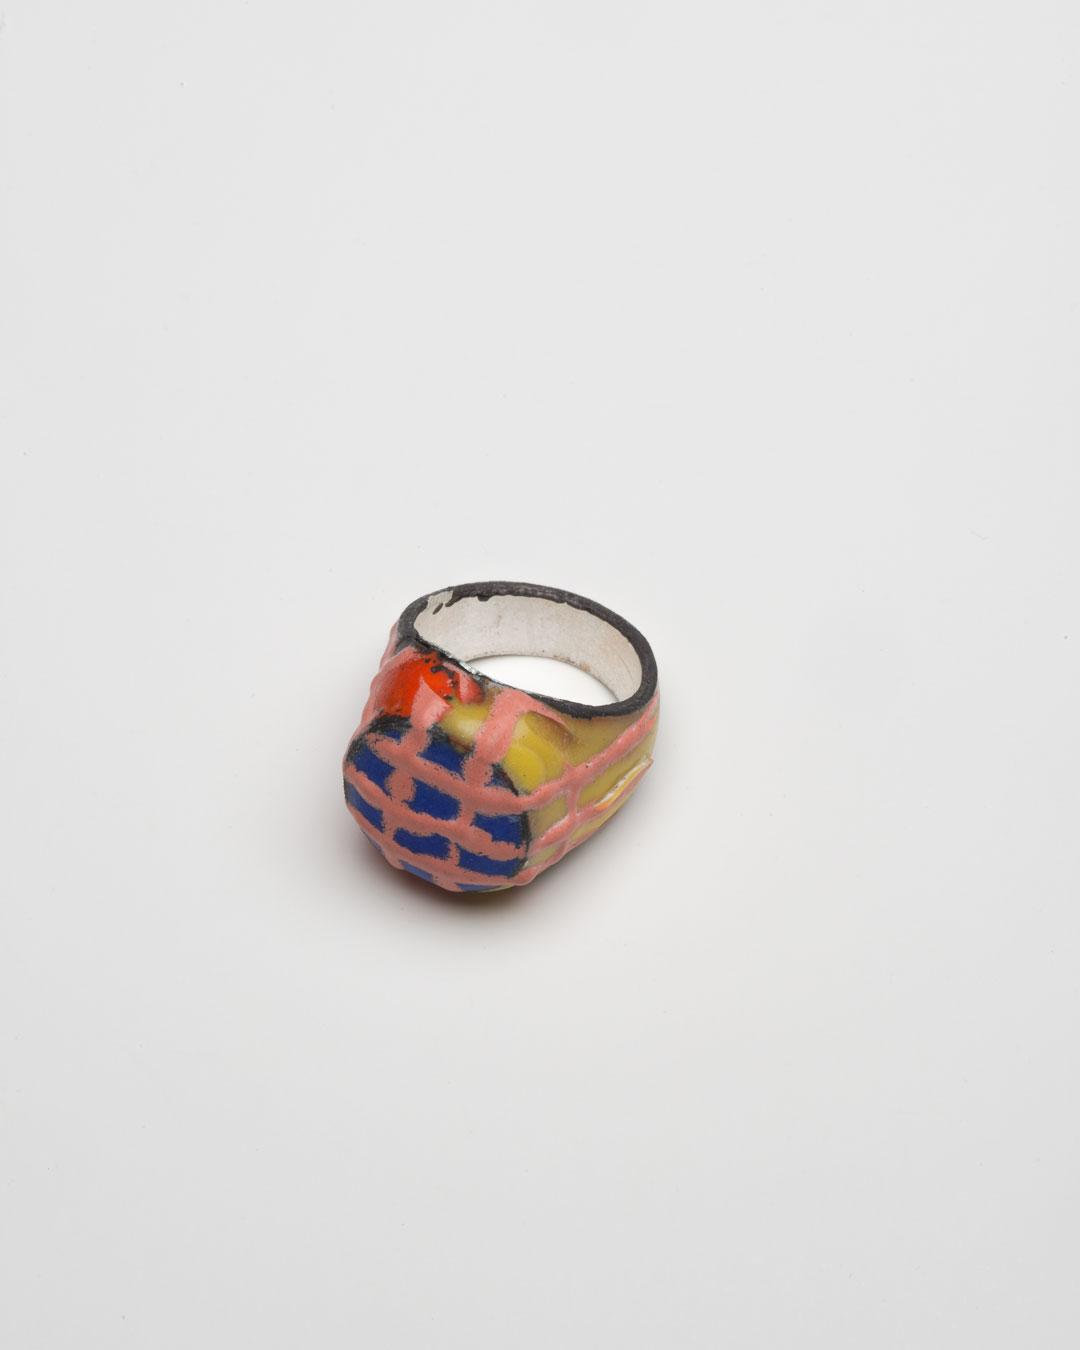 Aaron Decker, Magicring, 2018, ring; enamel, copper, silver, €1000